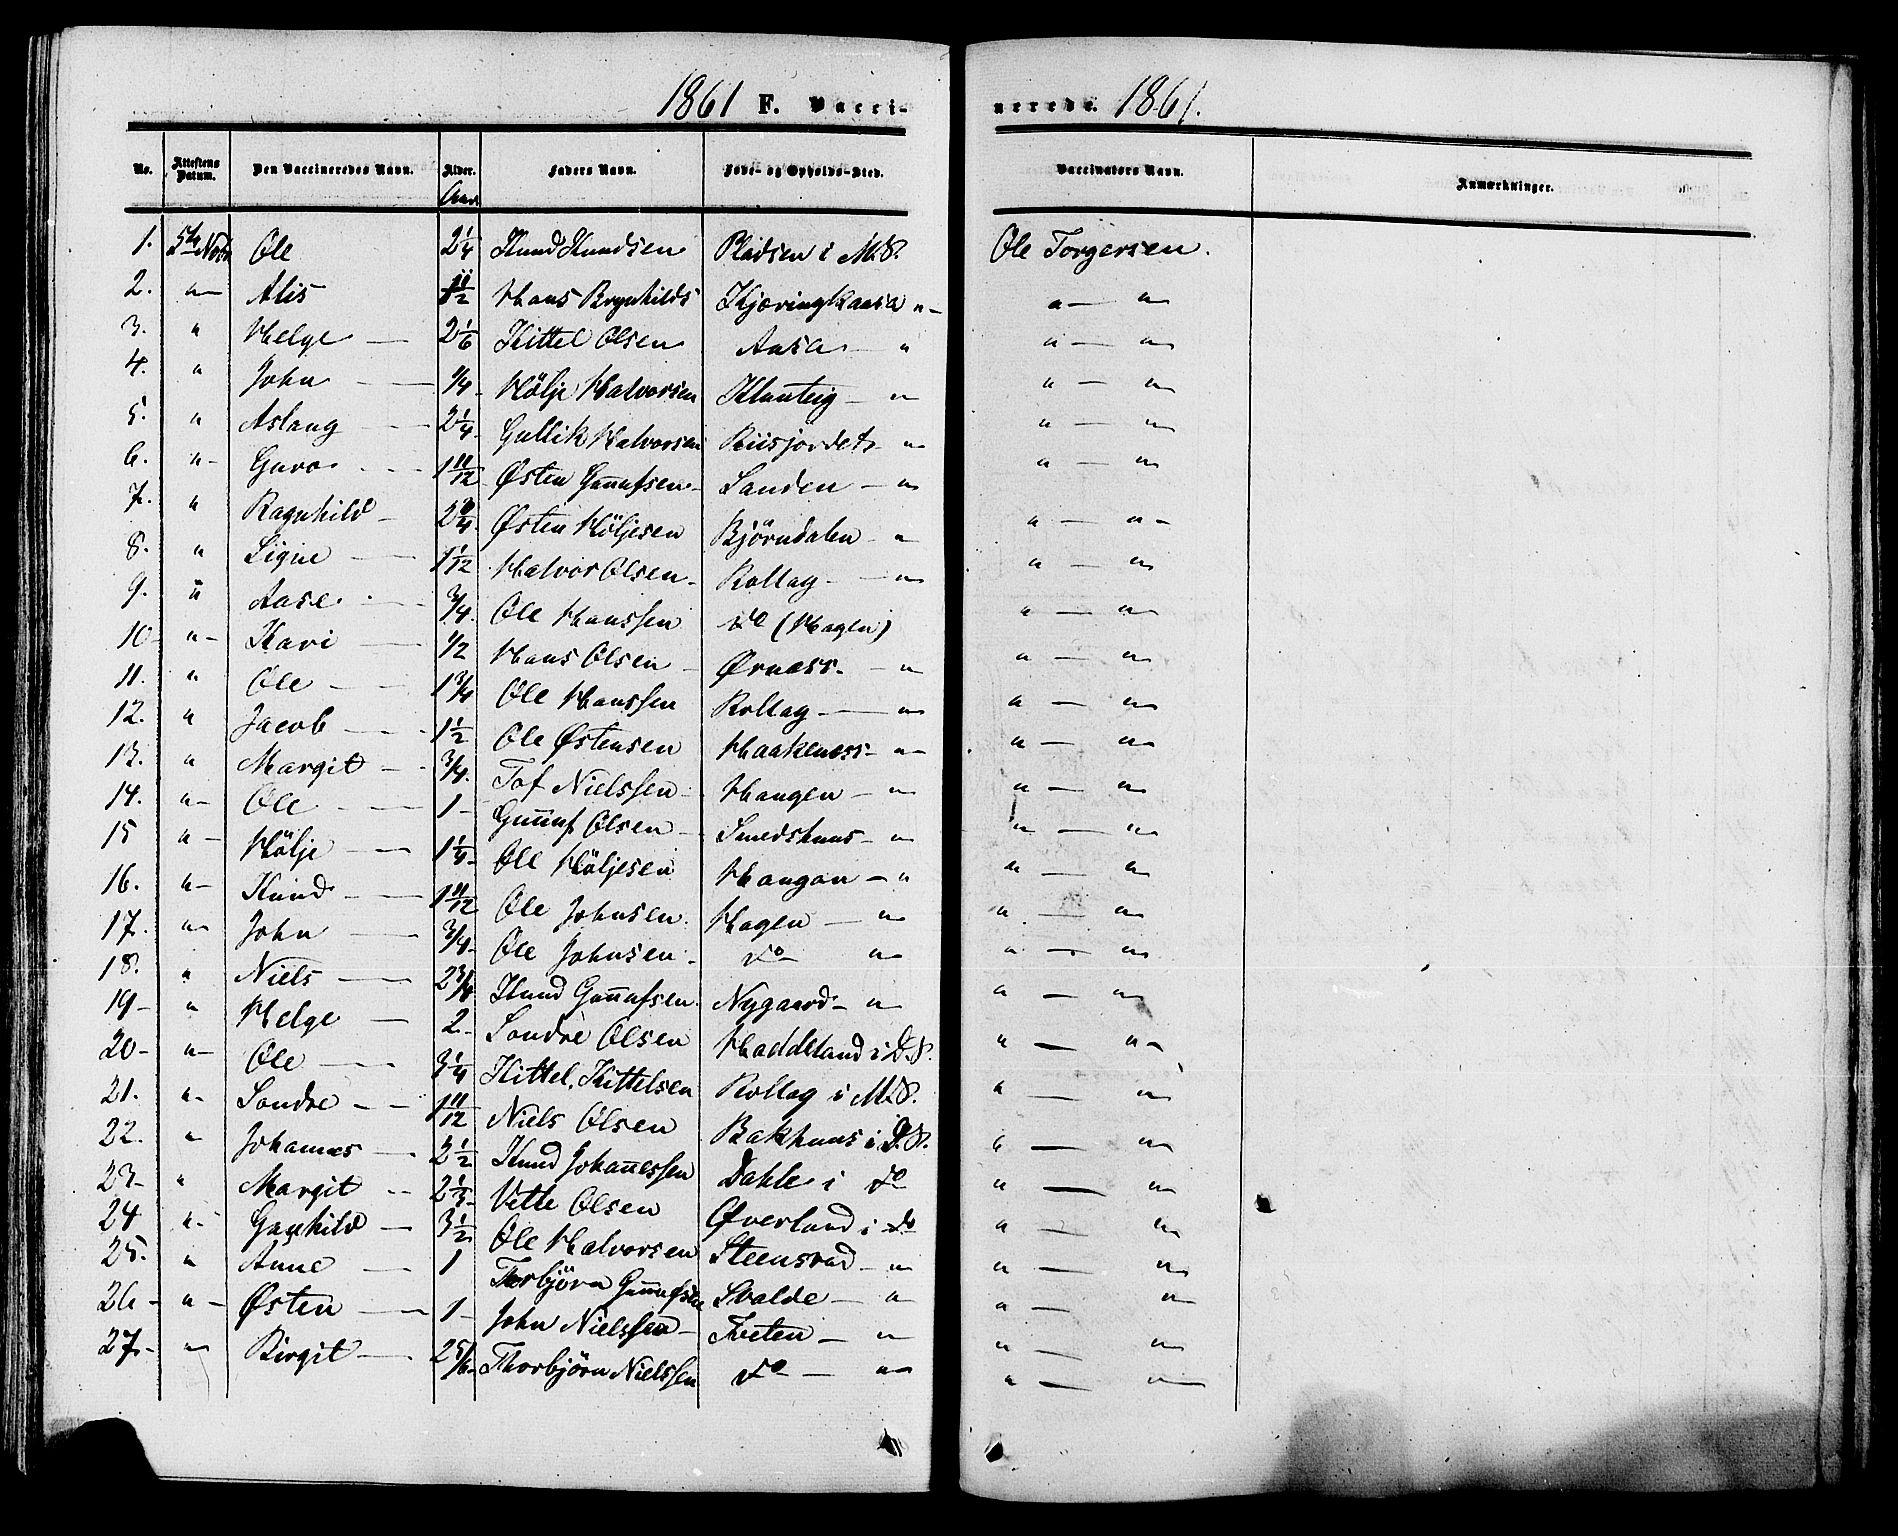 SAKO, Tinn kirkebøker, F/Fa/L0006: Ministerialbok nr. I 6, 1857-1878, s. 413